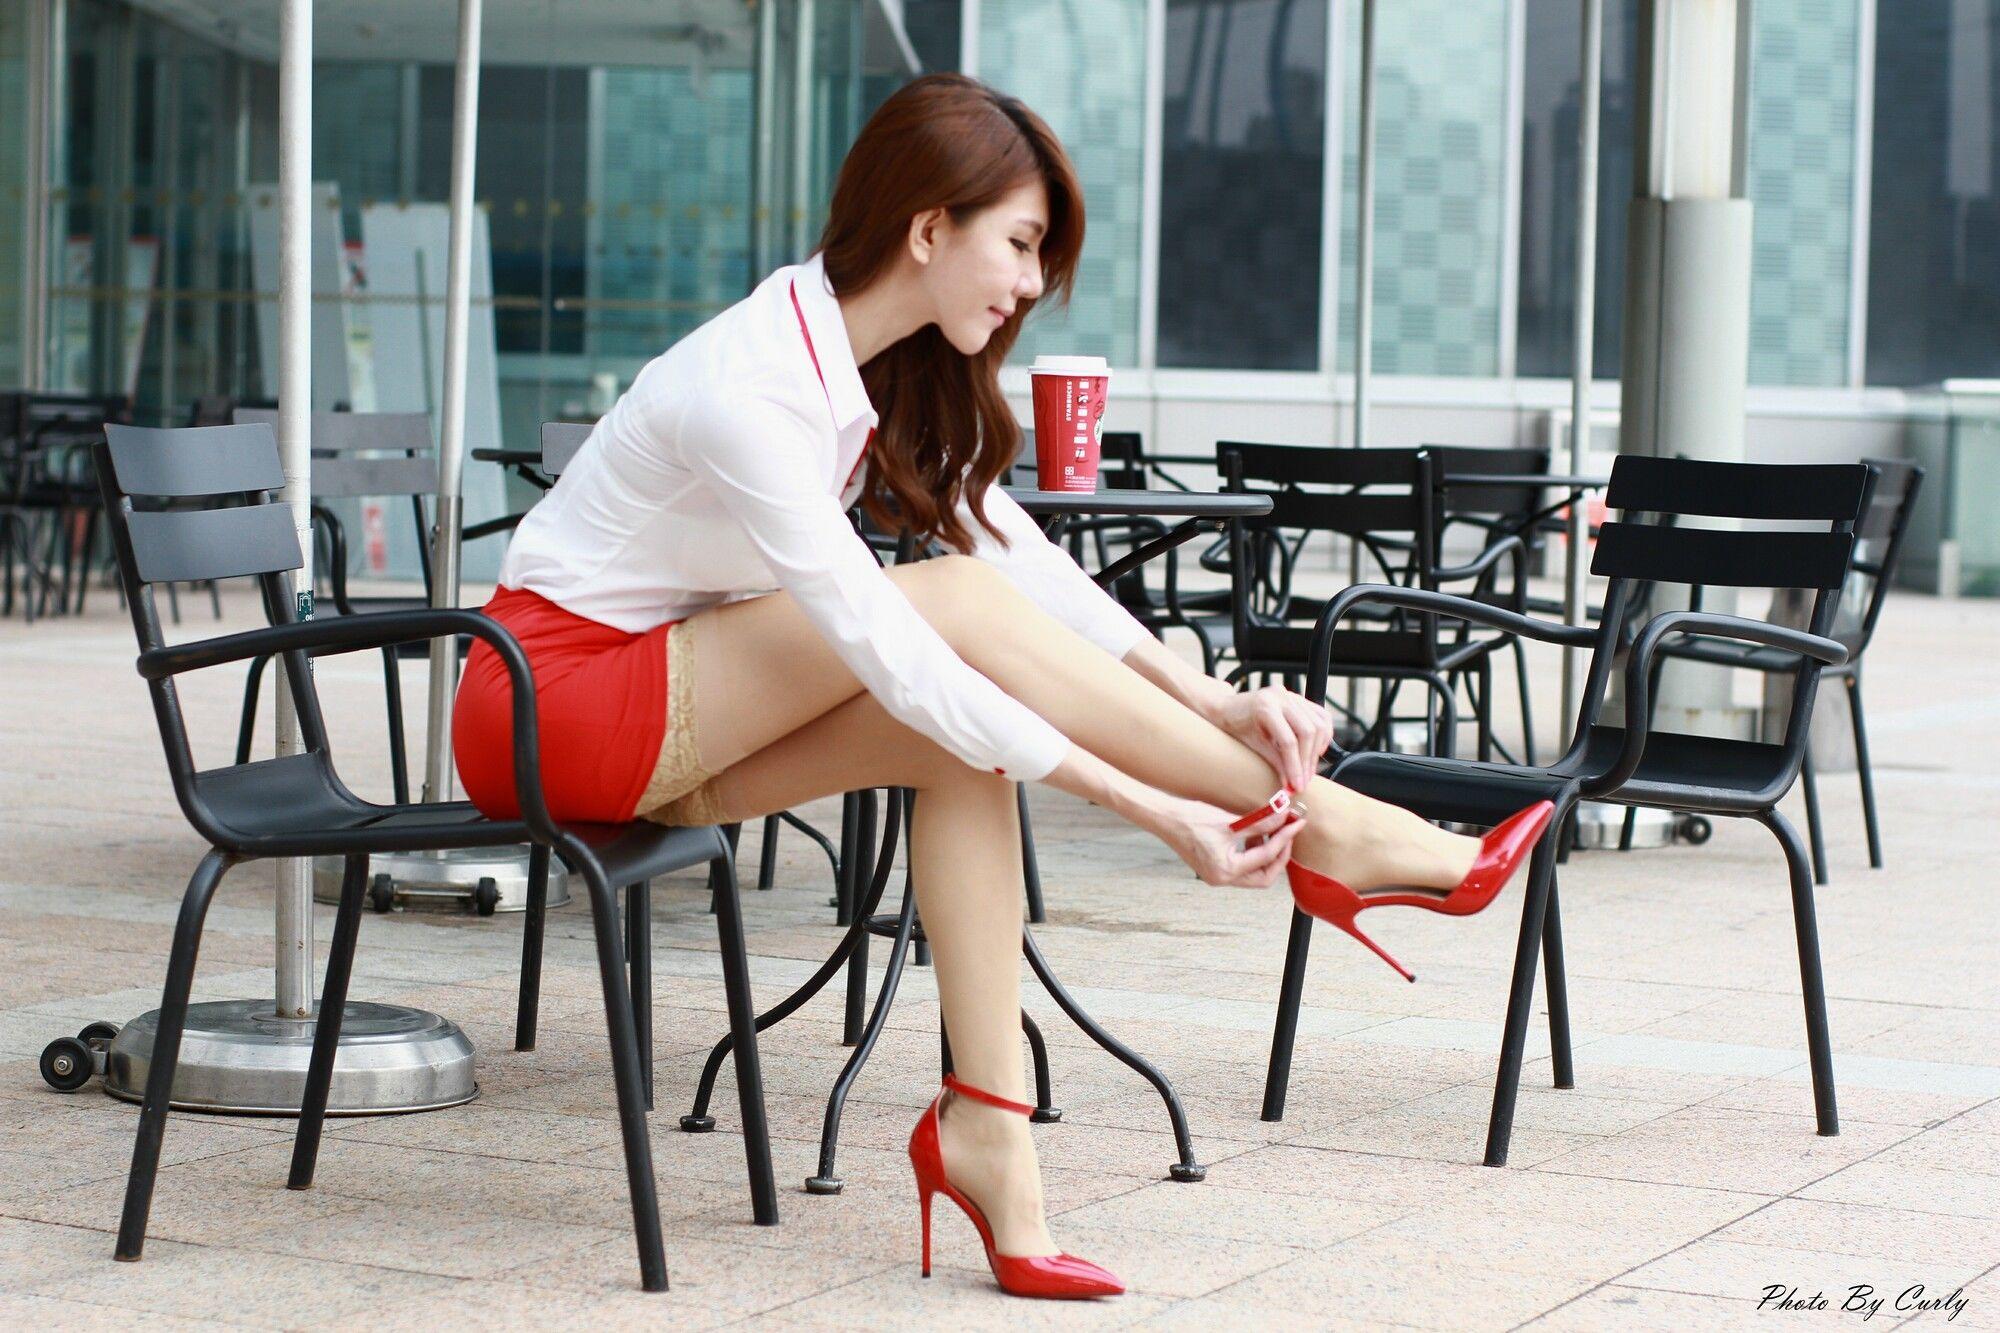 VOL.1249 [台湾正妹]肉丝袜OL美女长腿美女街拍美臀:黄淑华(腿模Maggie)超高清个人性感漂亮大图(64P)